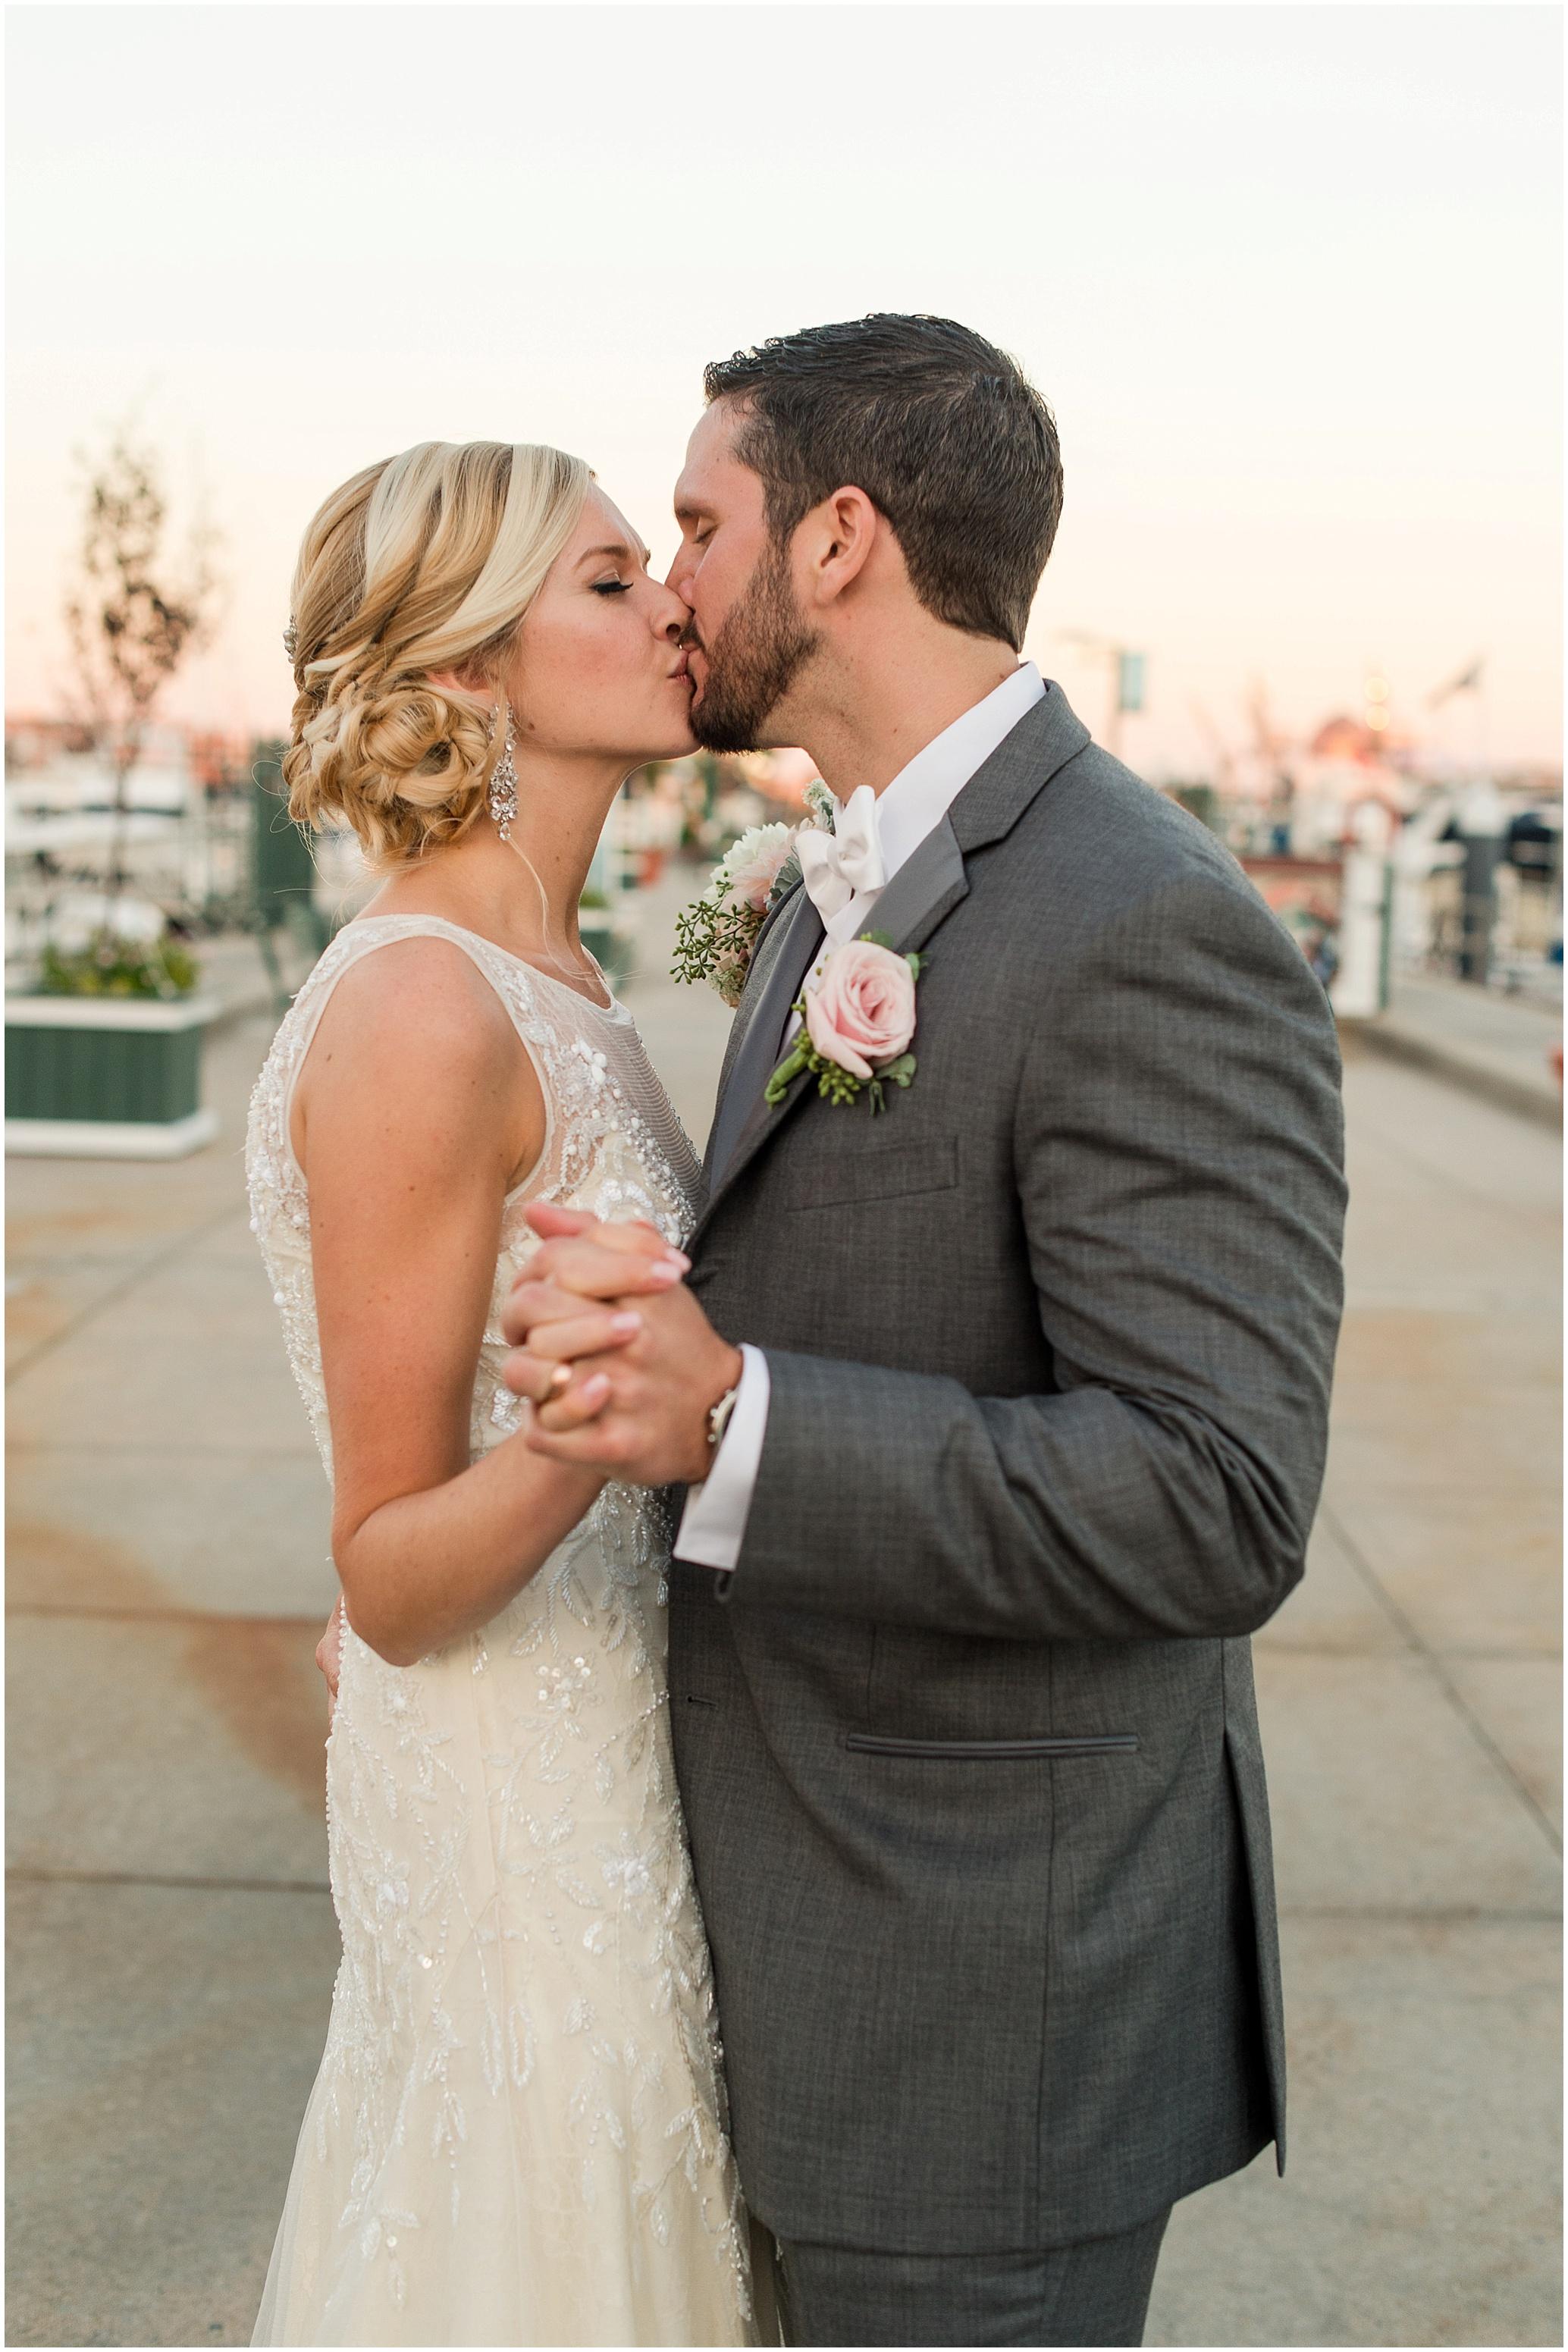 Hannah Leigh Photography Tabrizis Baltimore Wedding_2259.jpg